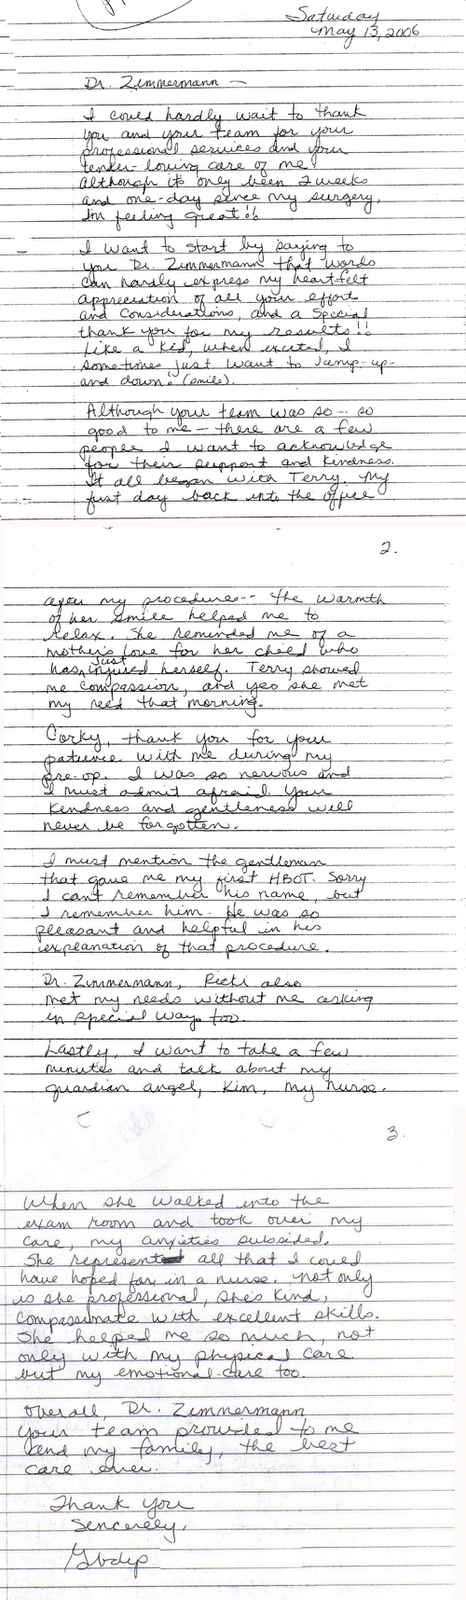 testimonials-image02